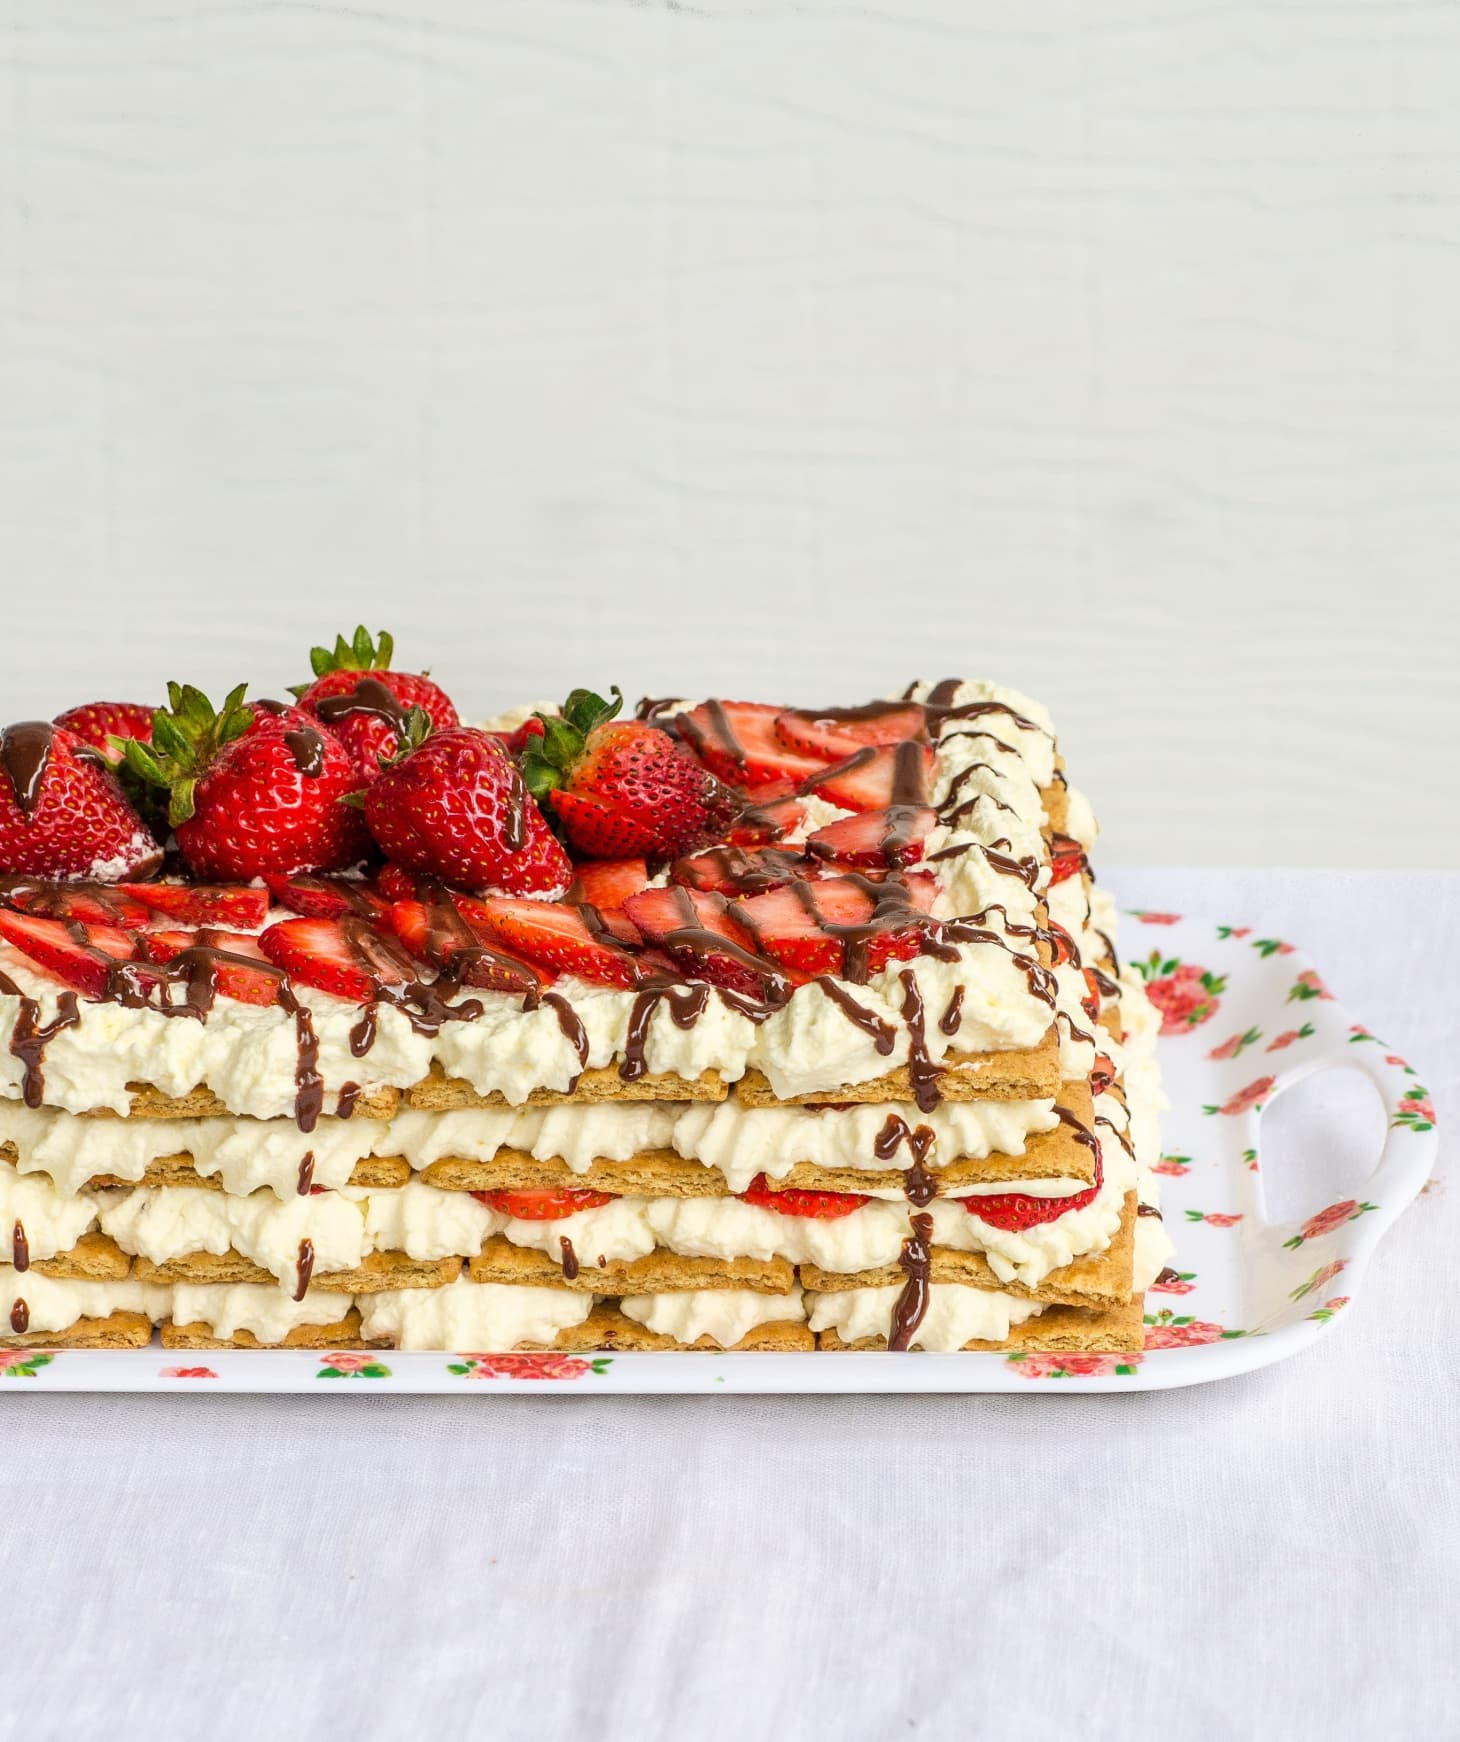 Strawberry Icebox Cake: Recipe: No-Bake Strawberry Icebox Cake